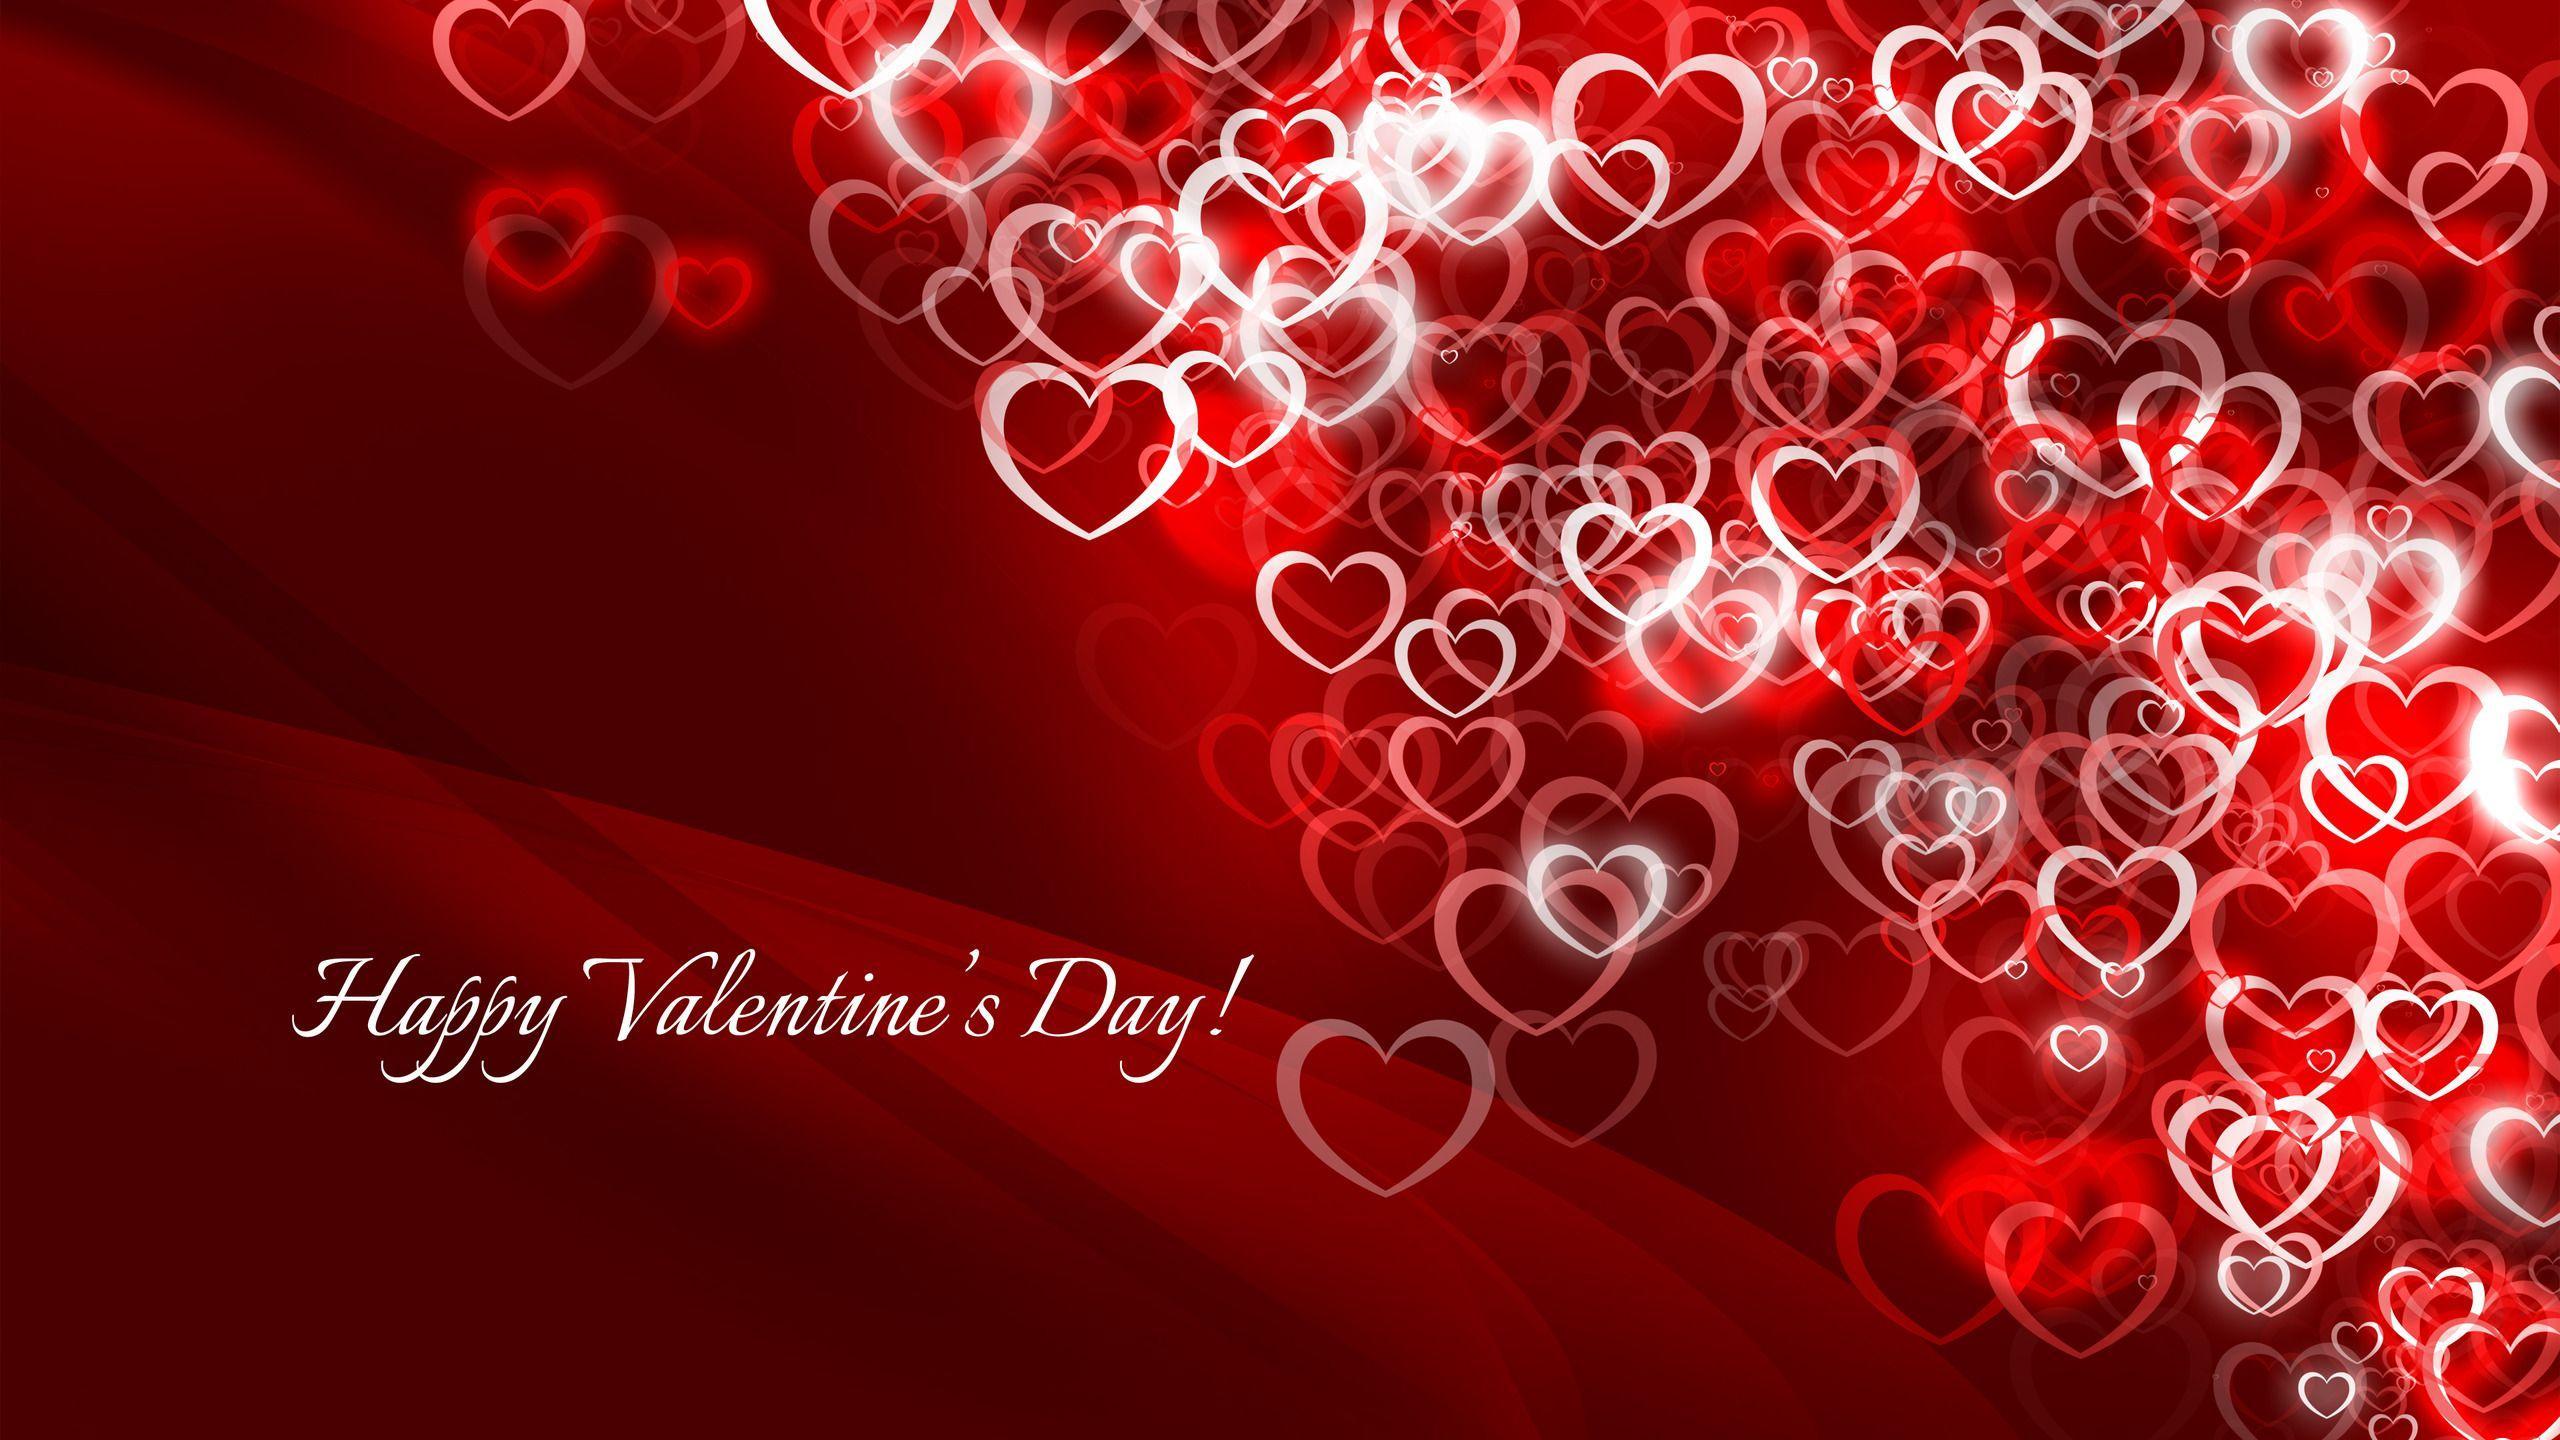 "valentine\u0027s wallpapers top free valentine\u0027s backgrounds2560x1440 happy valentines day hearts hd wallpaper free dekstop\""\u003e download · 1920x1080"